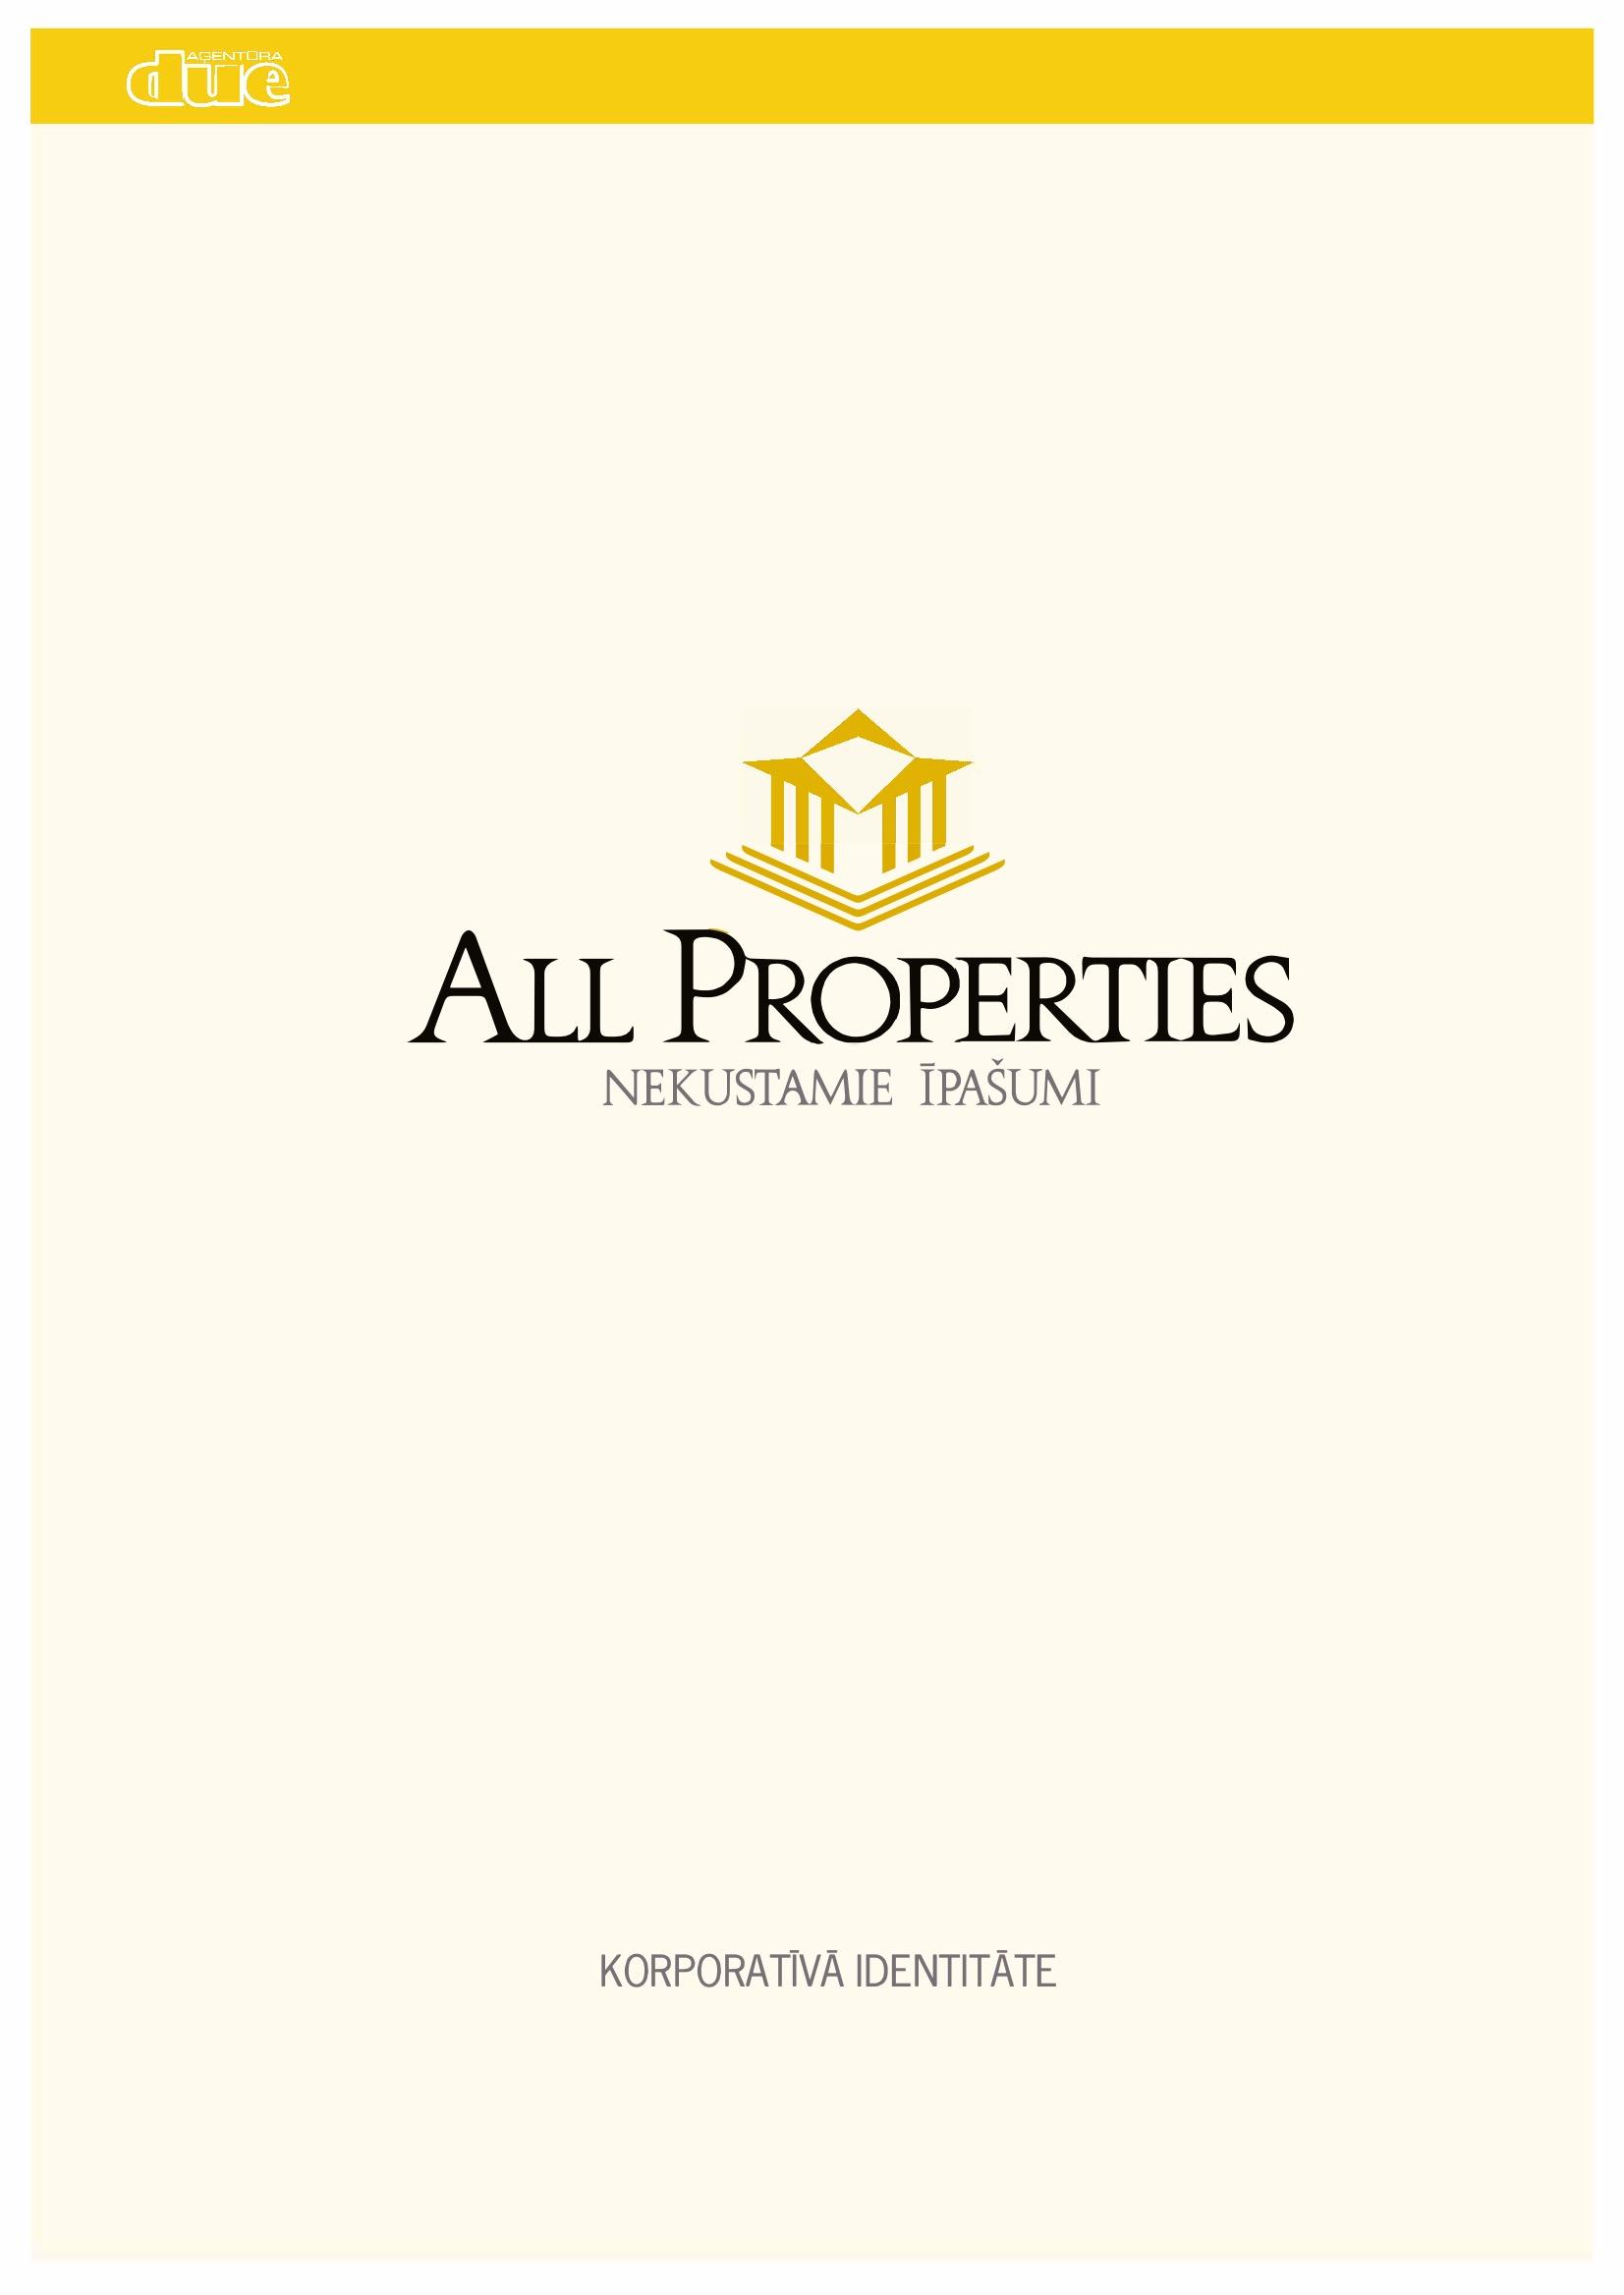 ALL_Properties_Stils 1